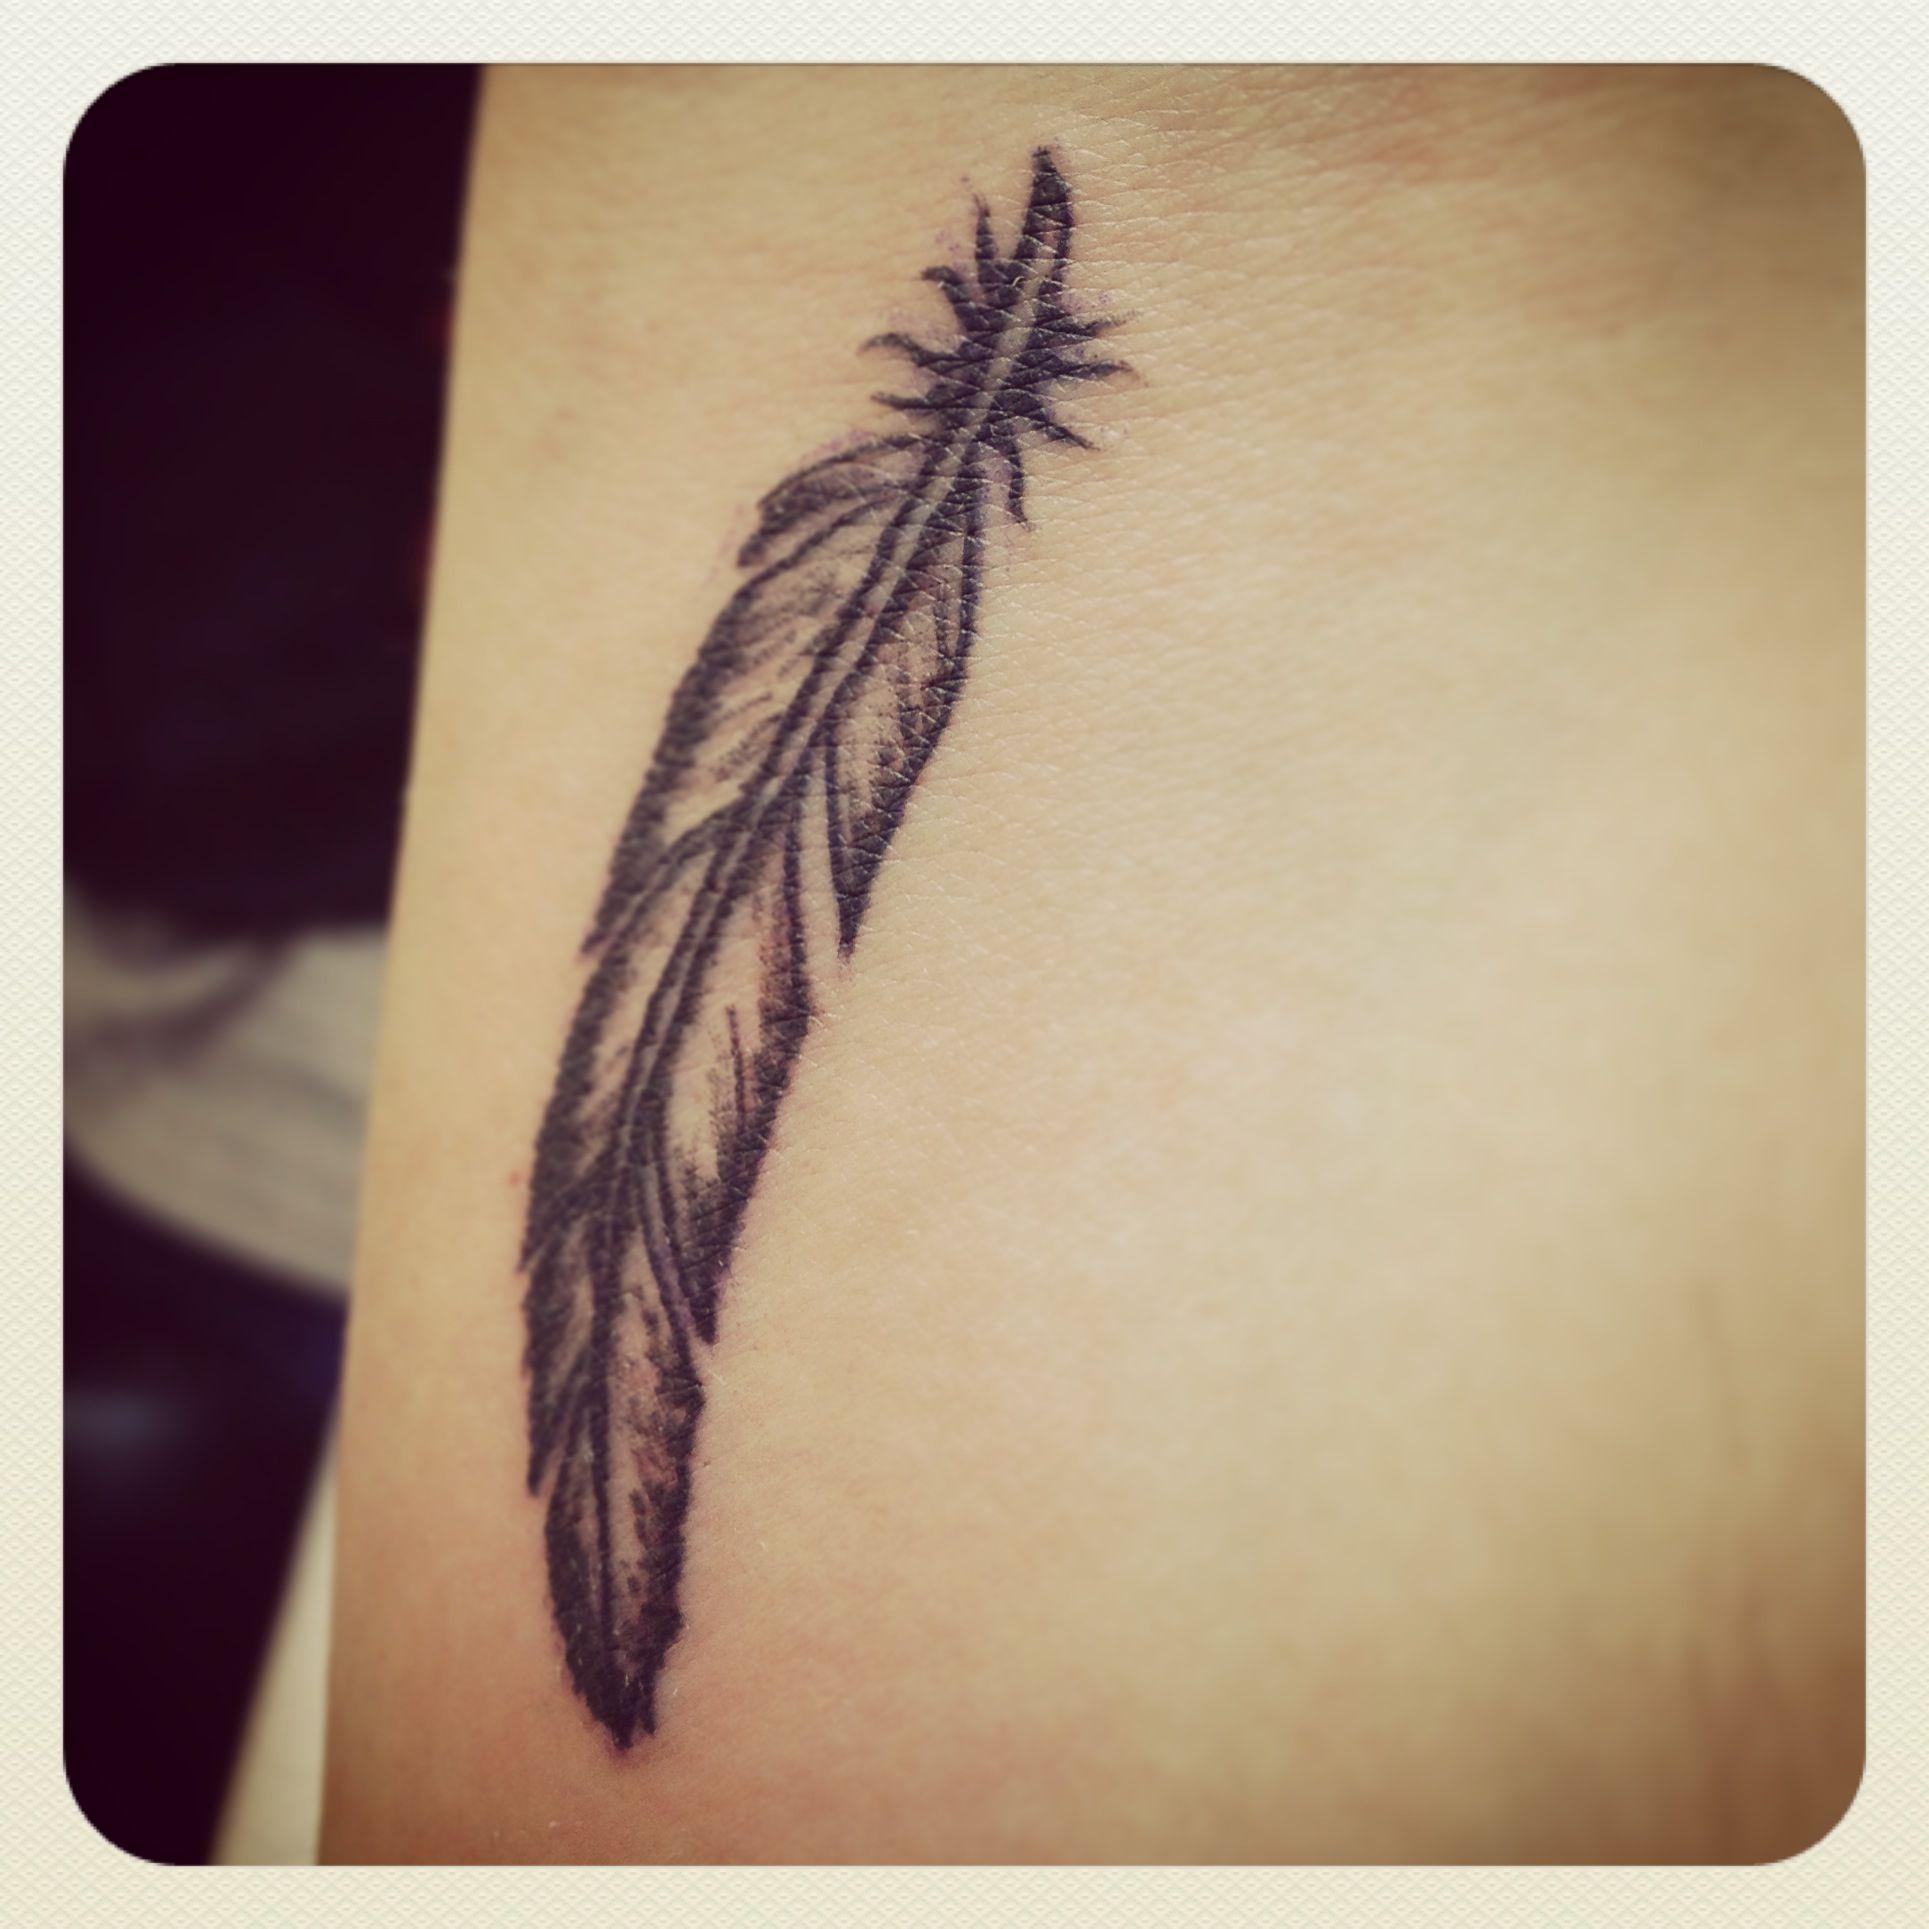 Feather Bracelet Tattoo On Wrist For Men: My New Feather Tattoo. Wrist. :-)